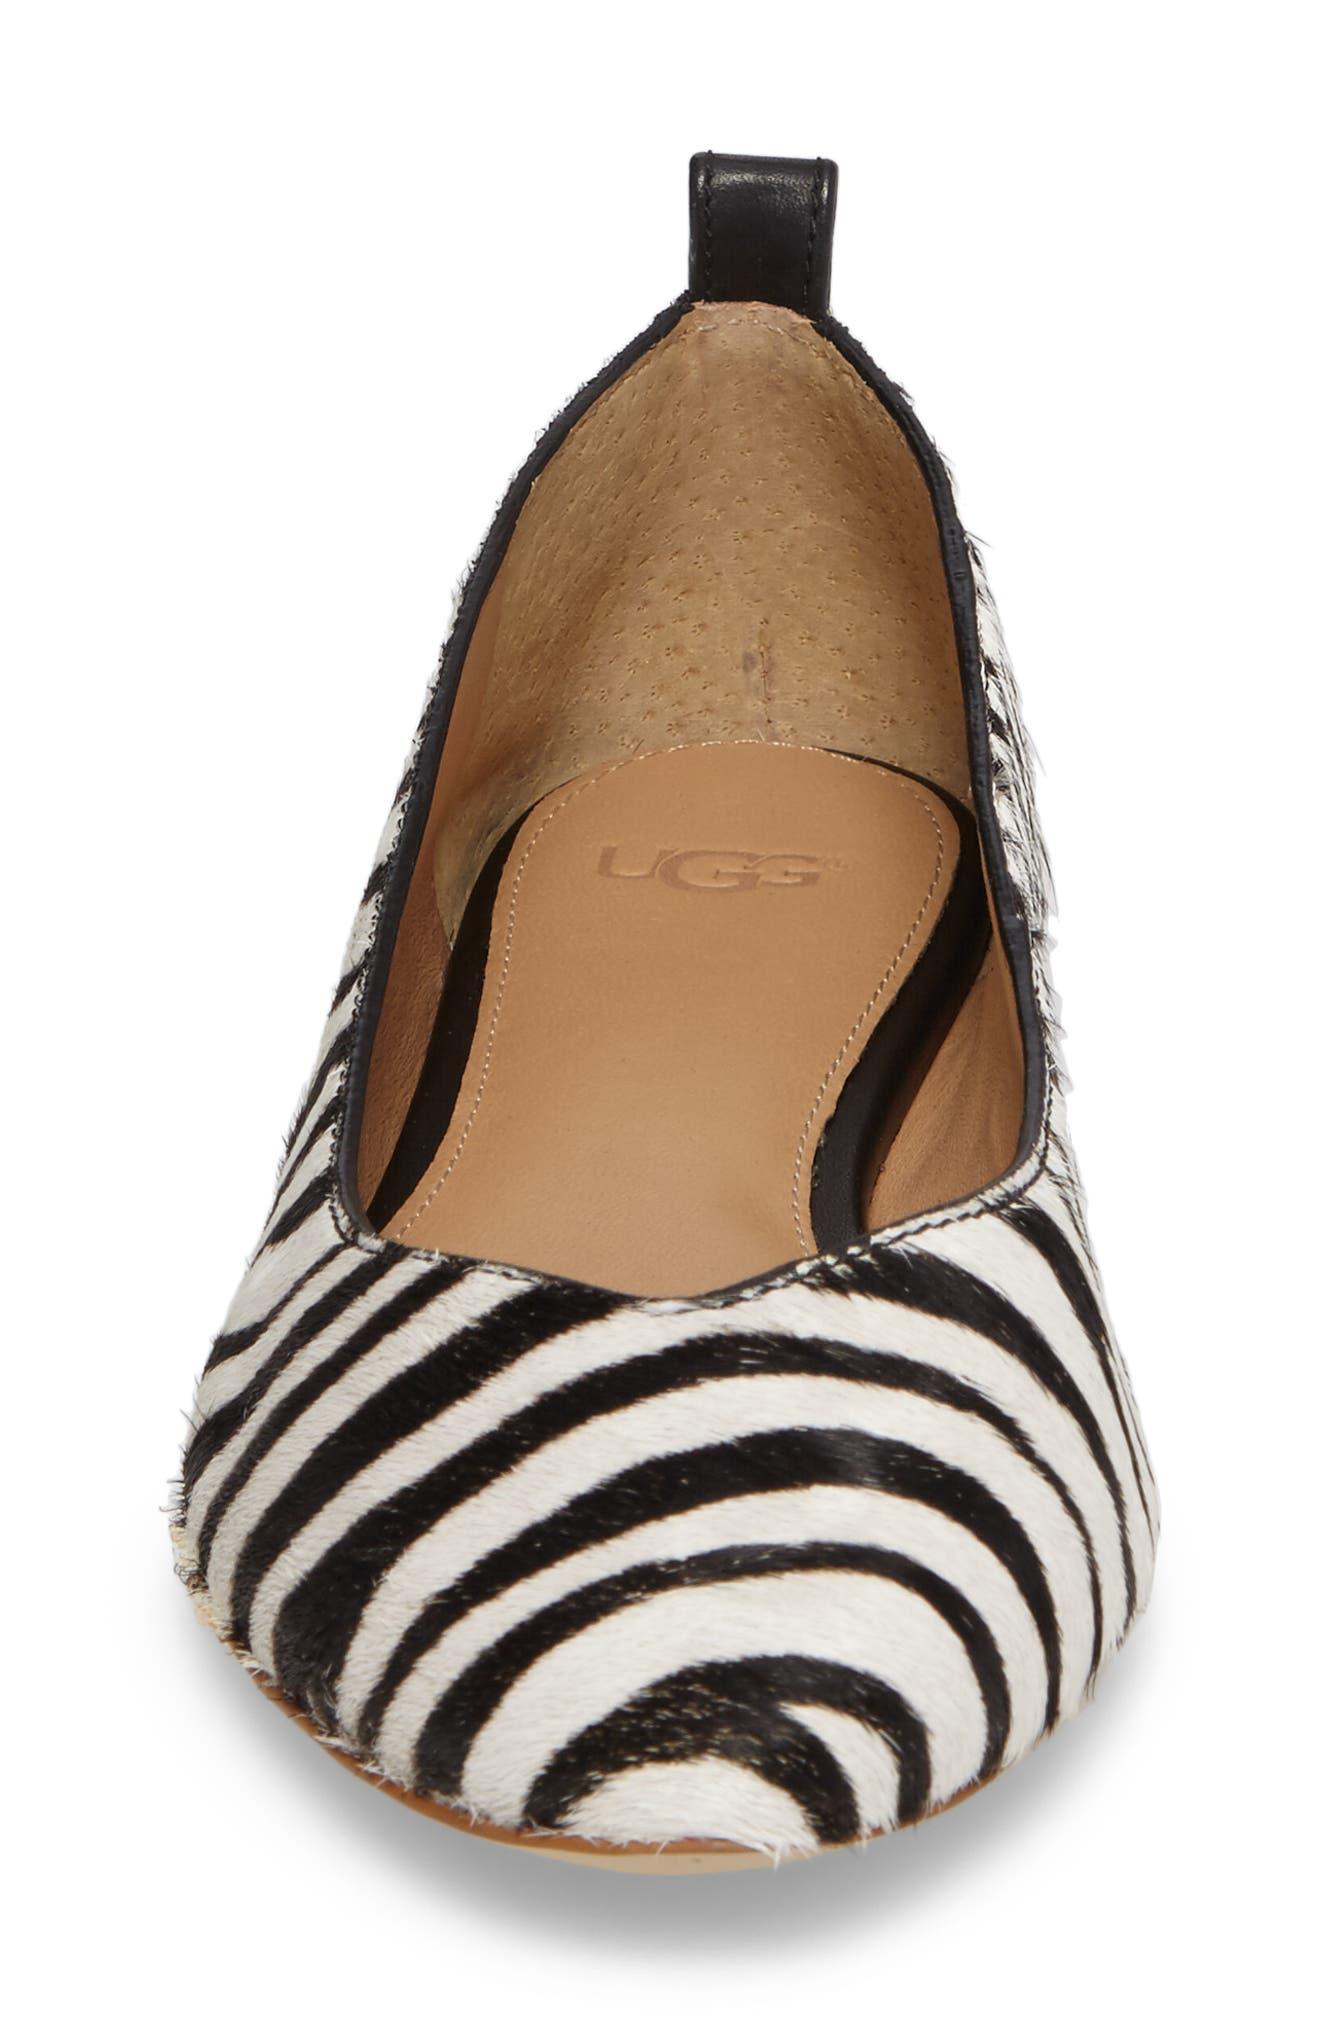 Lynley Genuine Calf Hair Flat,                             Alternate thumbnail 4, color,                             Zebra Calf Hair Leather